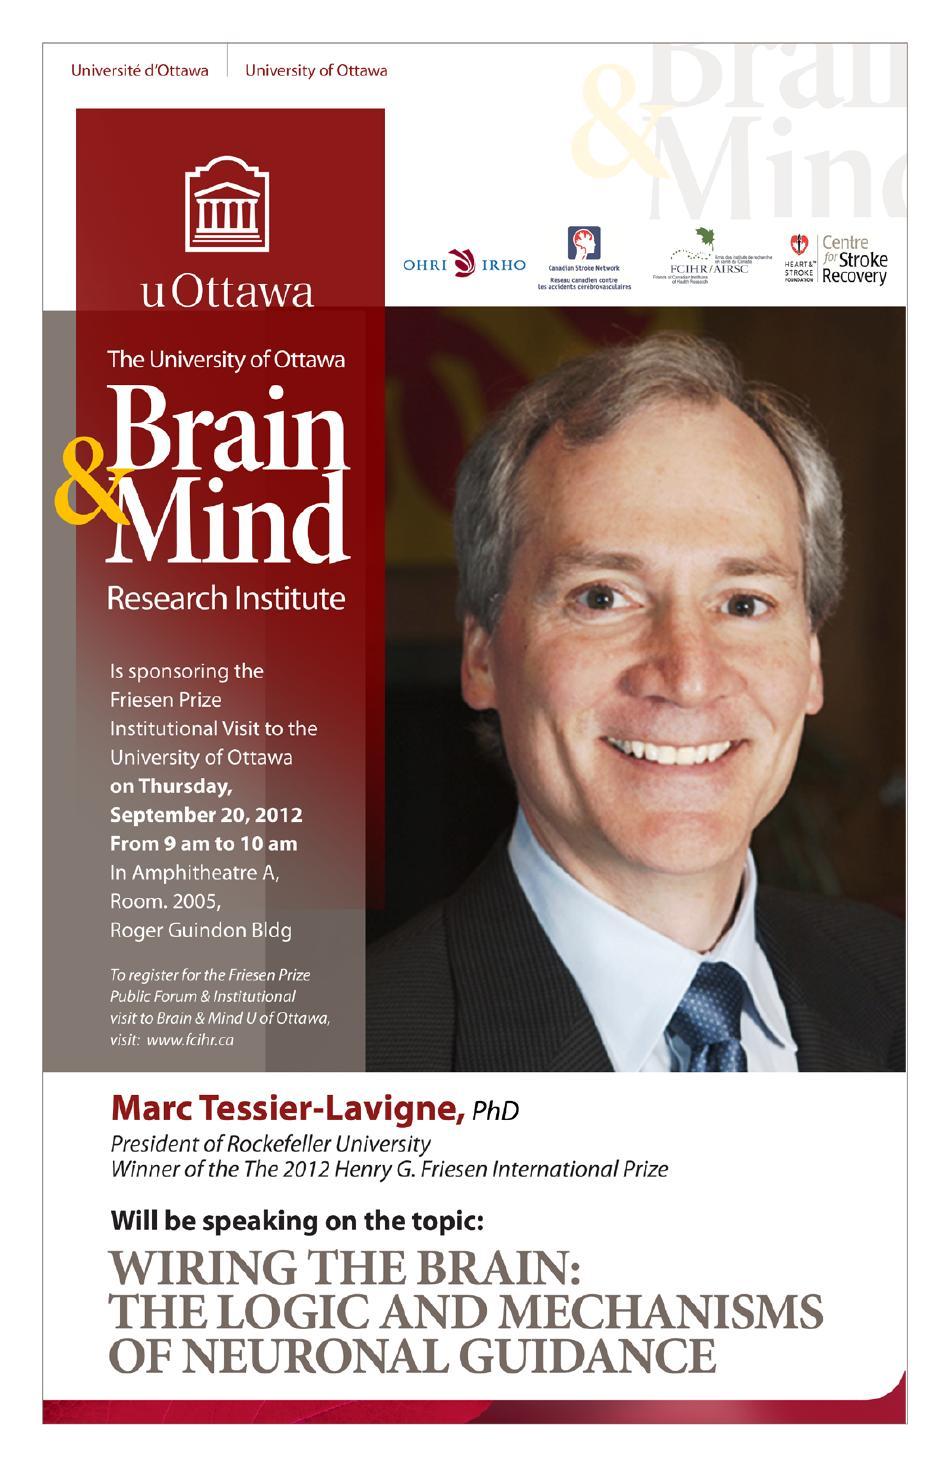 2012 Friesen Prize - Institutional visit - U of Ottawa Brain & Mind Institute - Dr. Marc Tessier-Lavigne